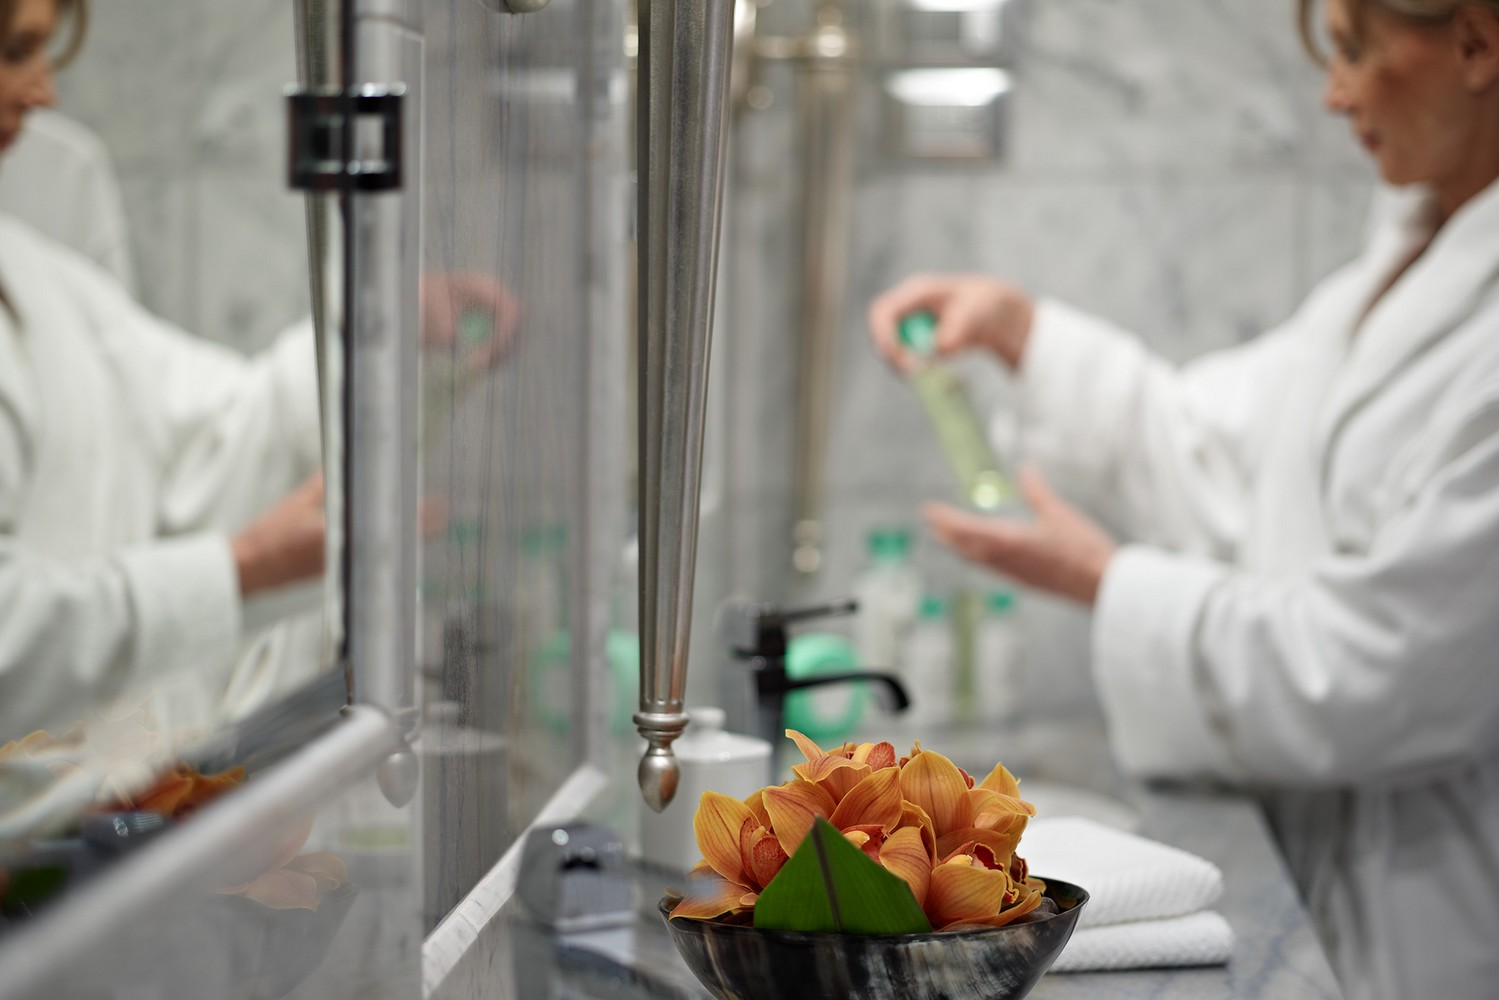 croisières oceania cruises confort luxe